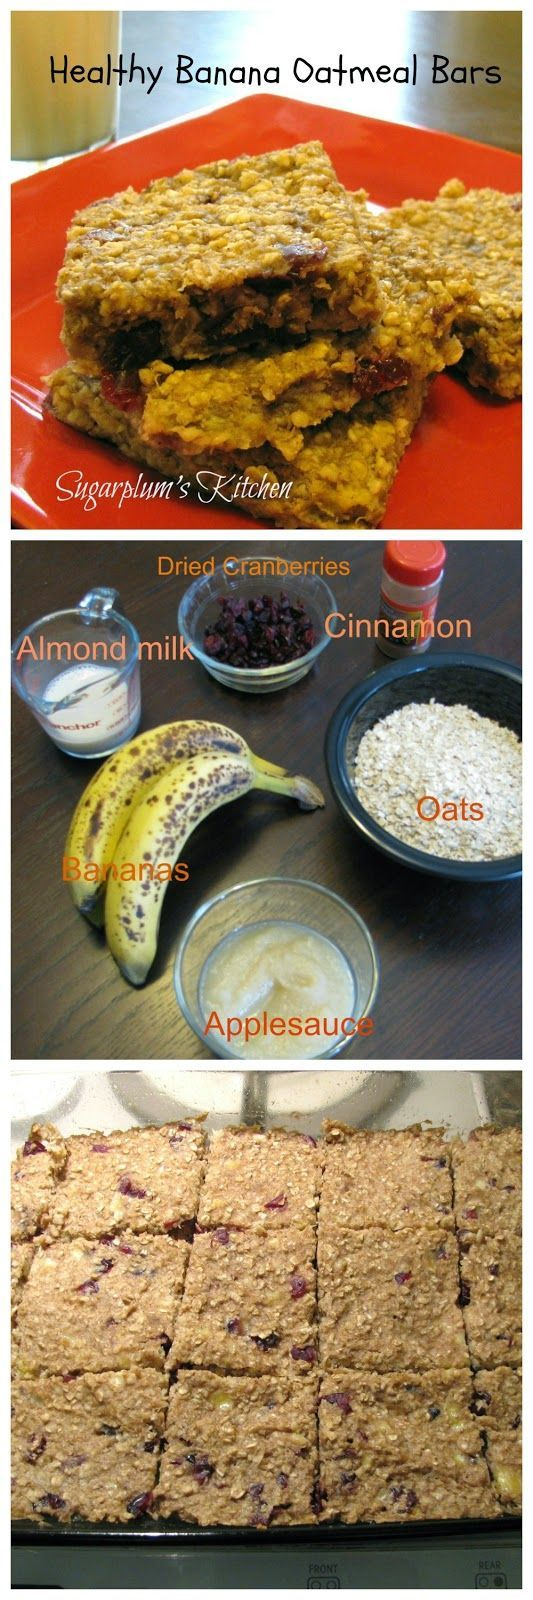 Healthy Banana Oatmeal Bars-A healthier snack with no added sugar!  Sugarplumskitchen.com